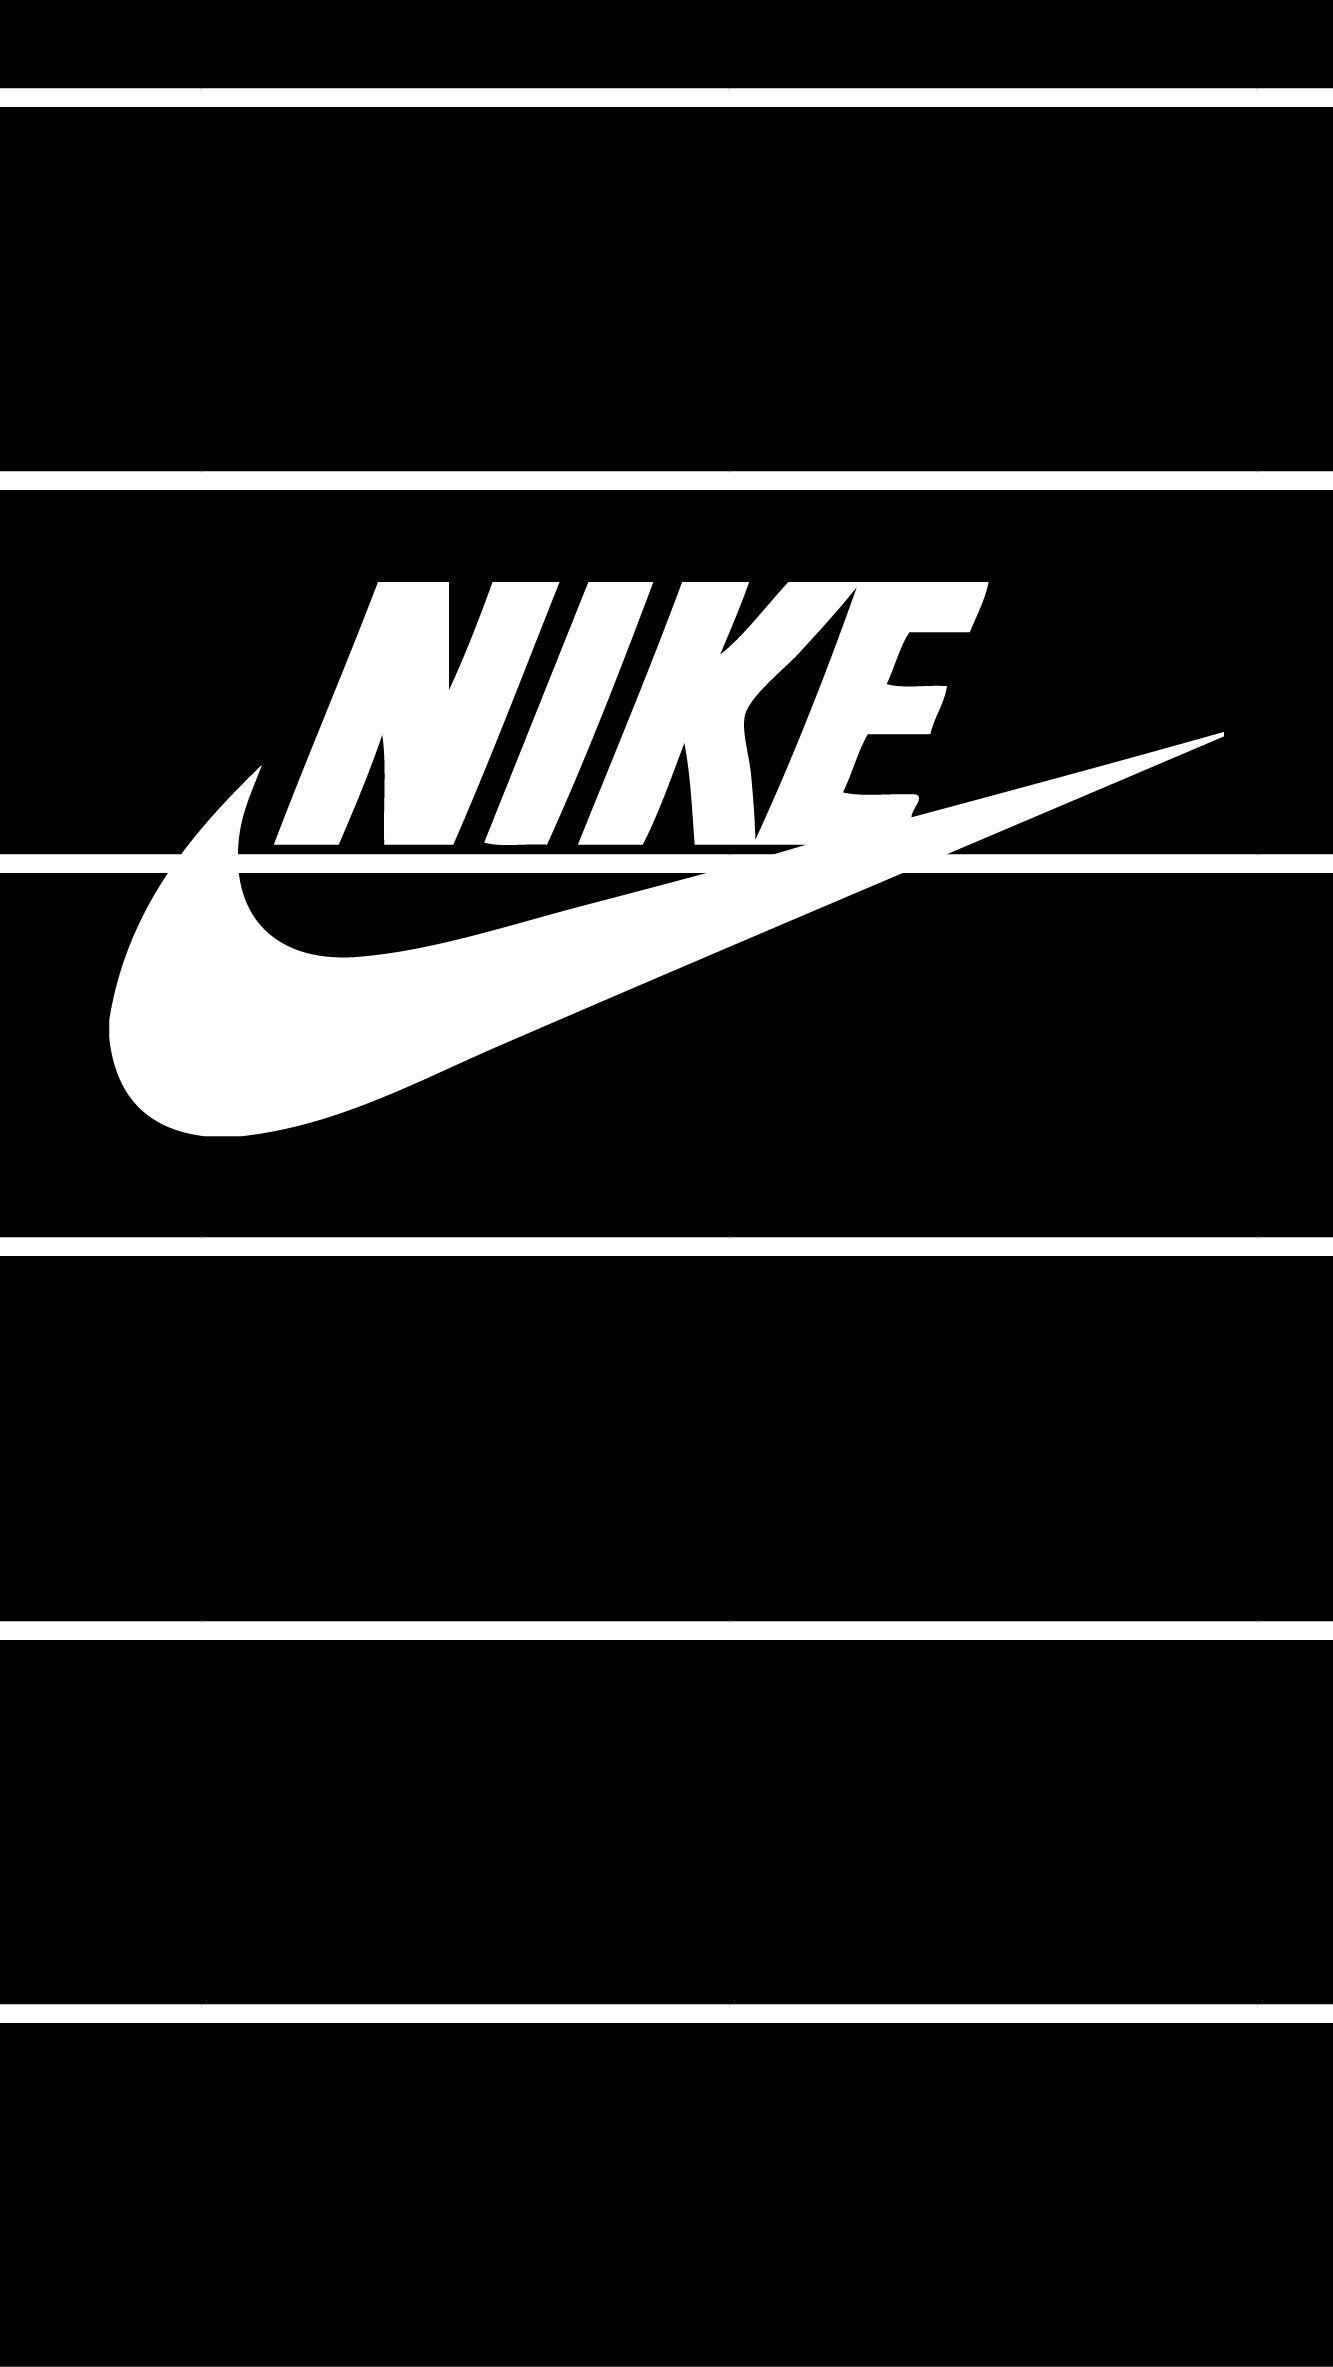 Res: 1333x2367, Nike Wallpaper 2